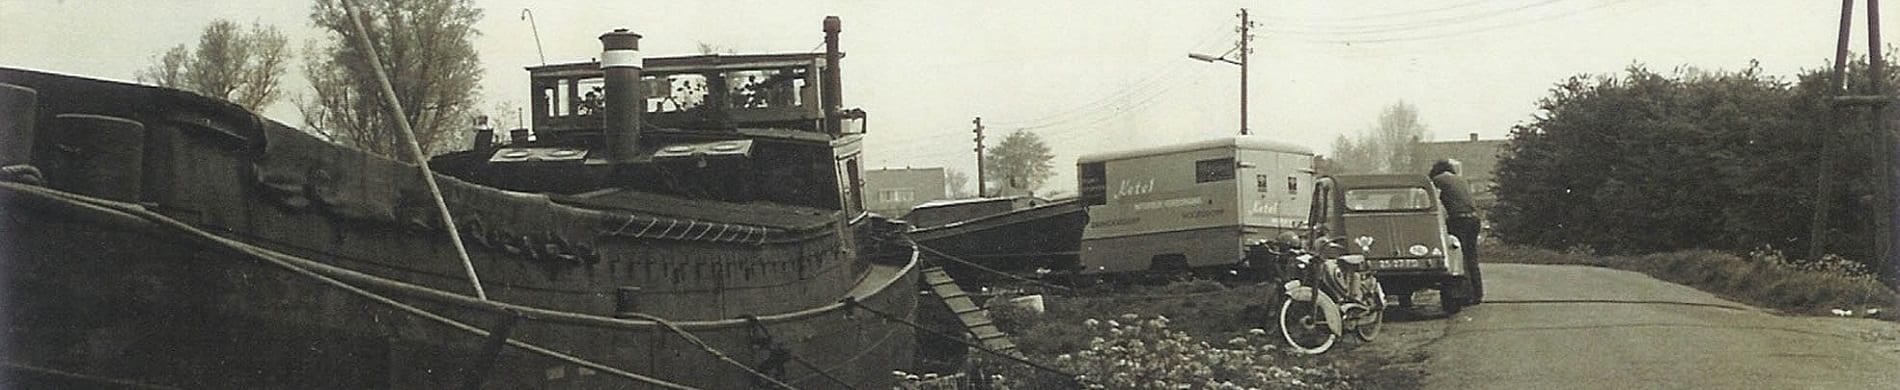 Geschichte Segelschiff